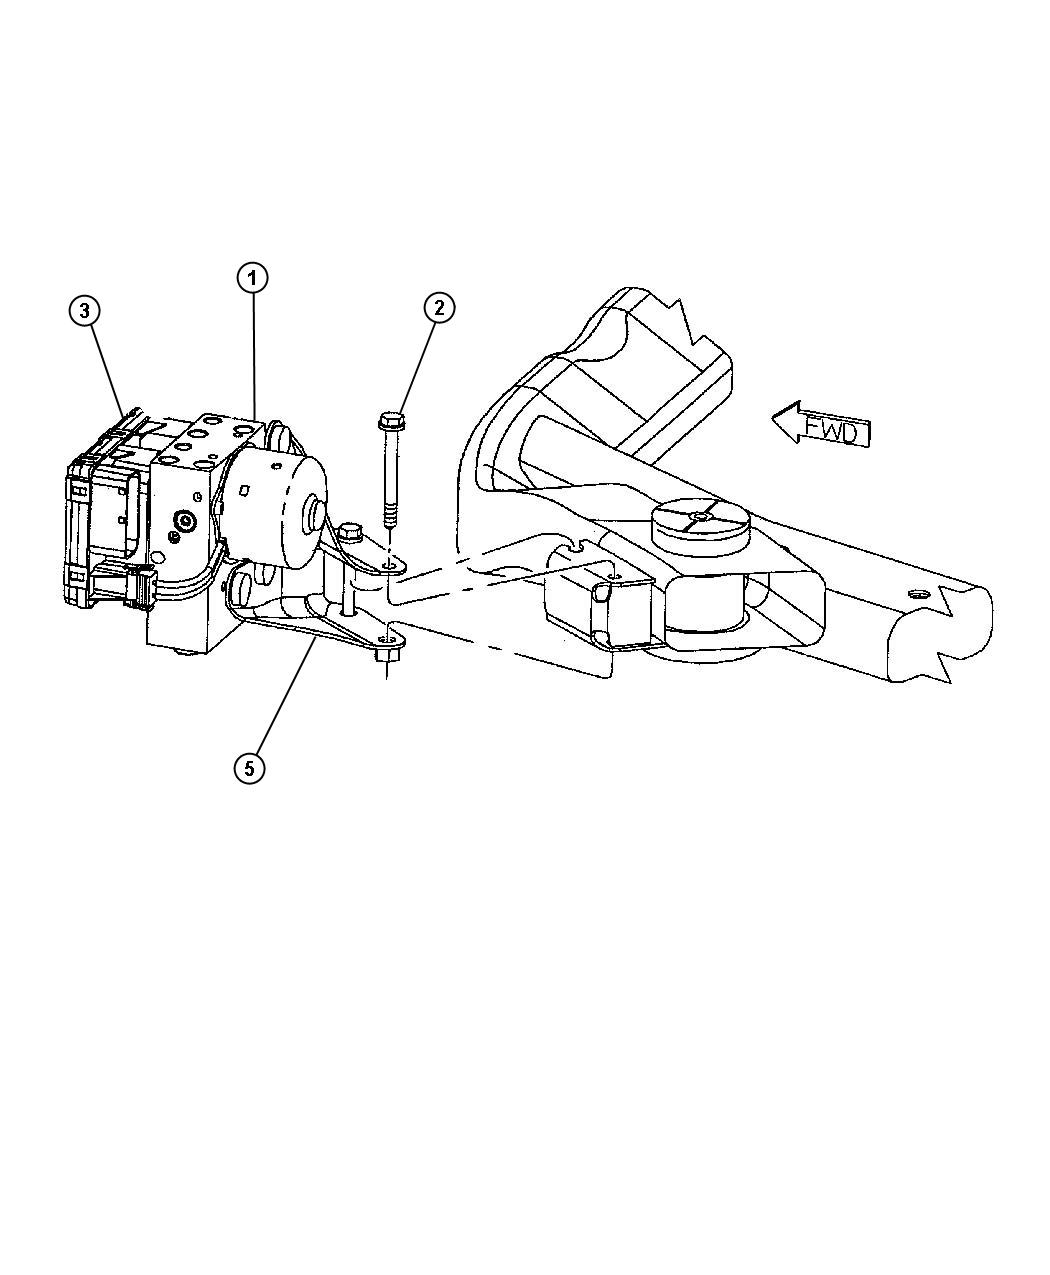 1999 Chrysler Concorde Screw  6 Lobed  Mounting